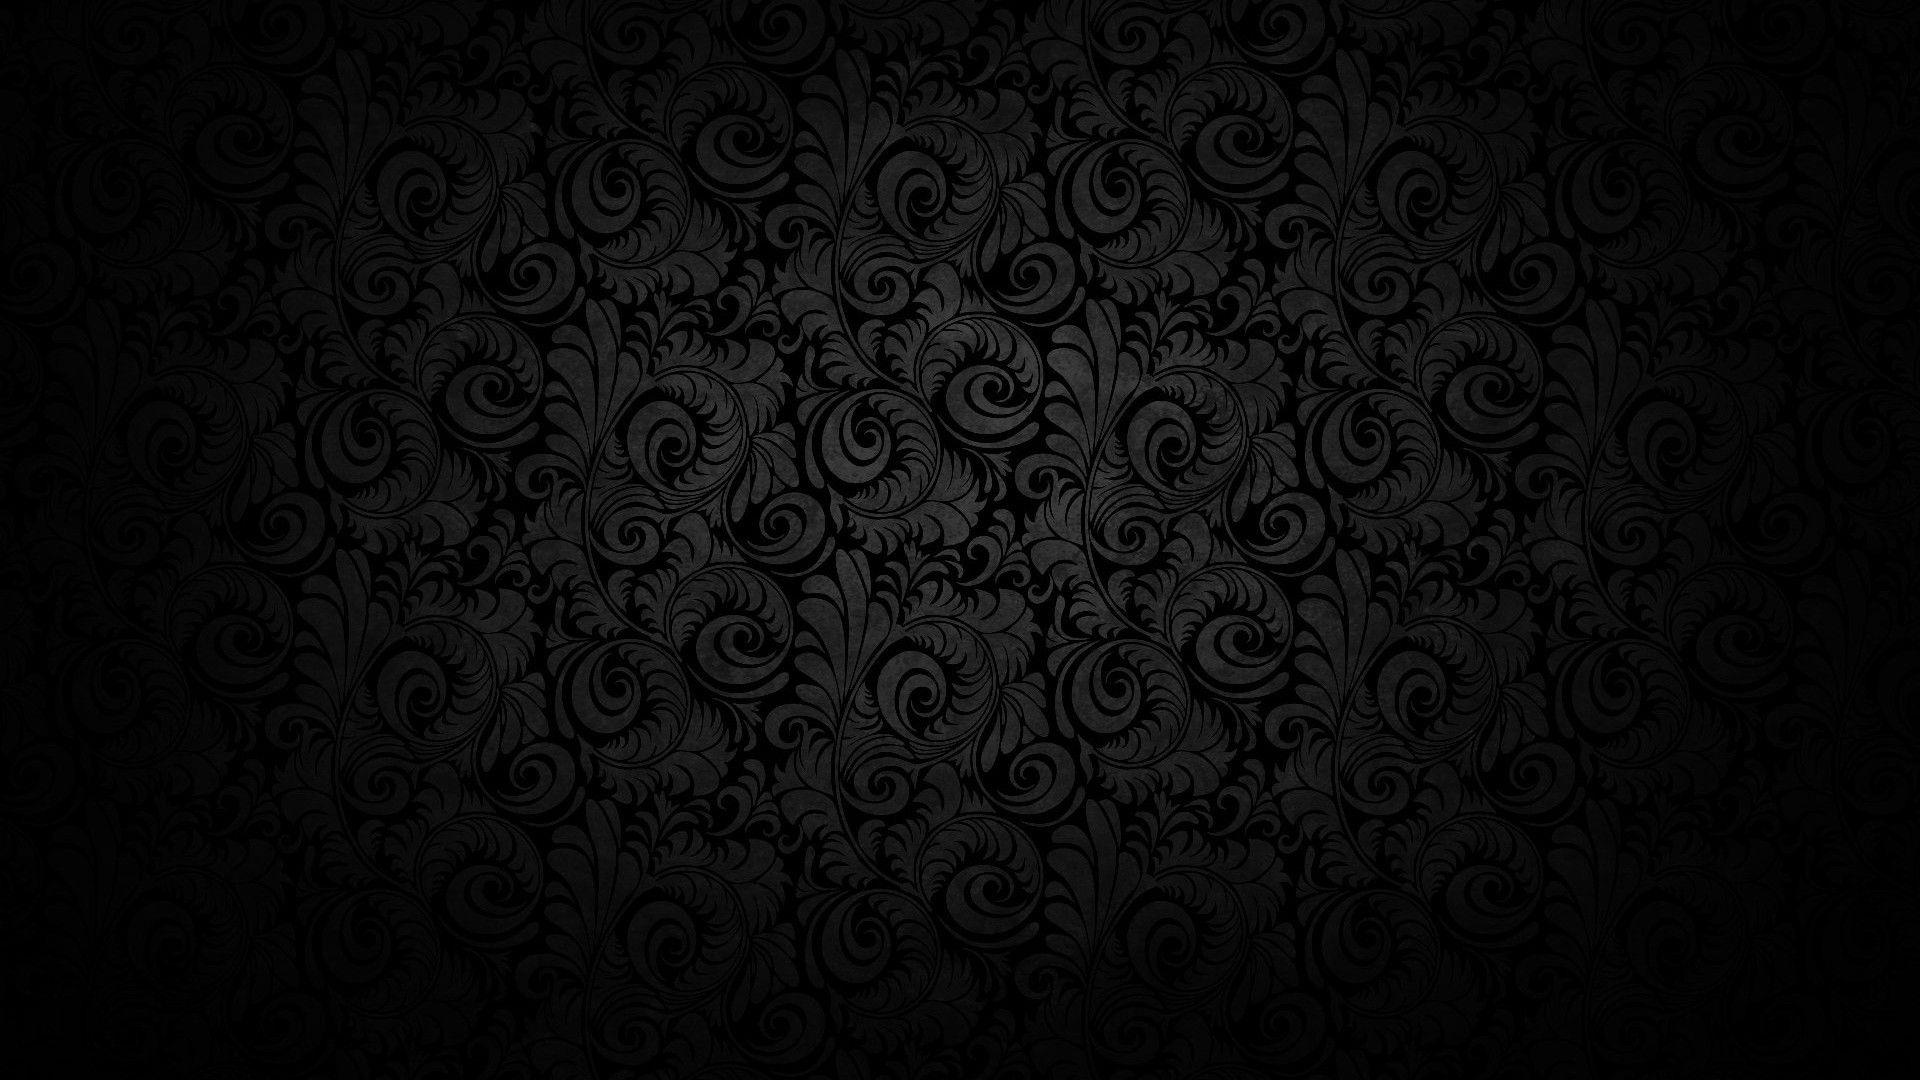 Elegant new wallpaper